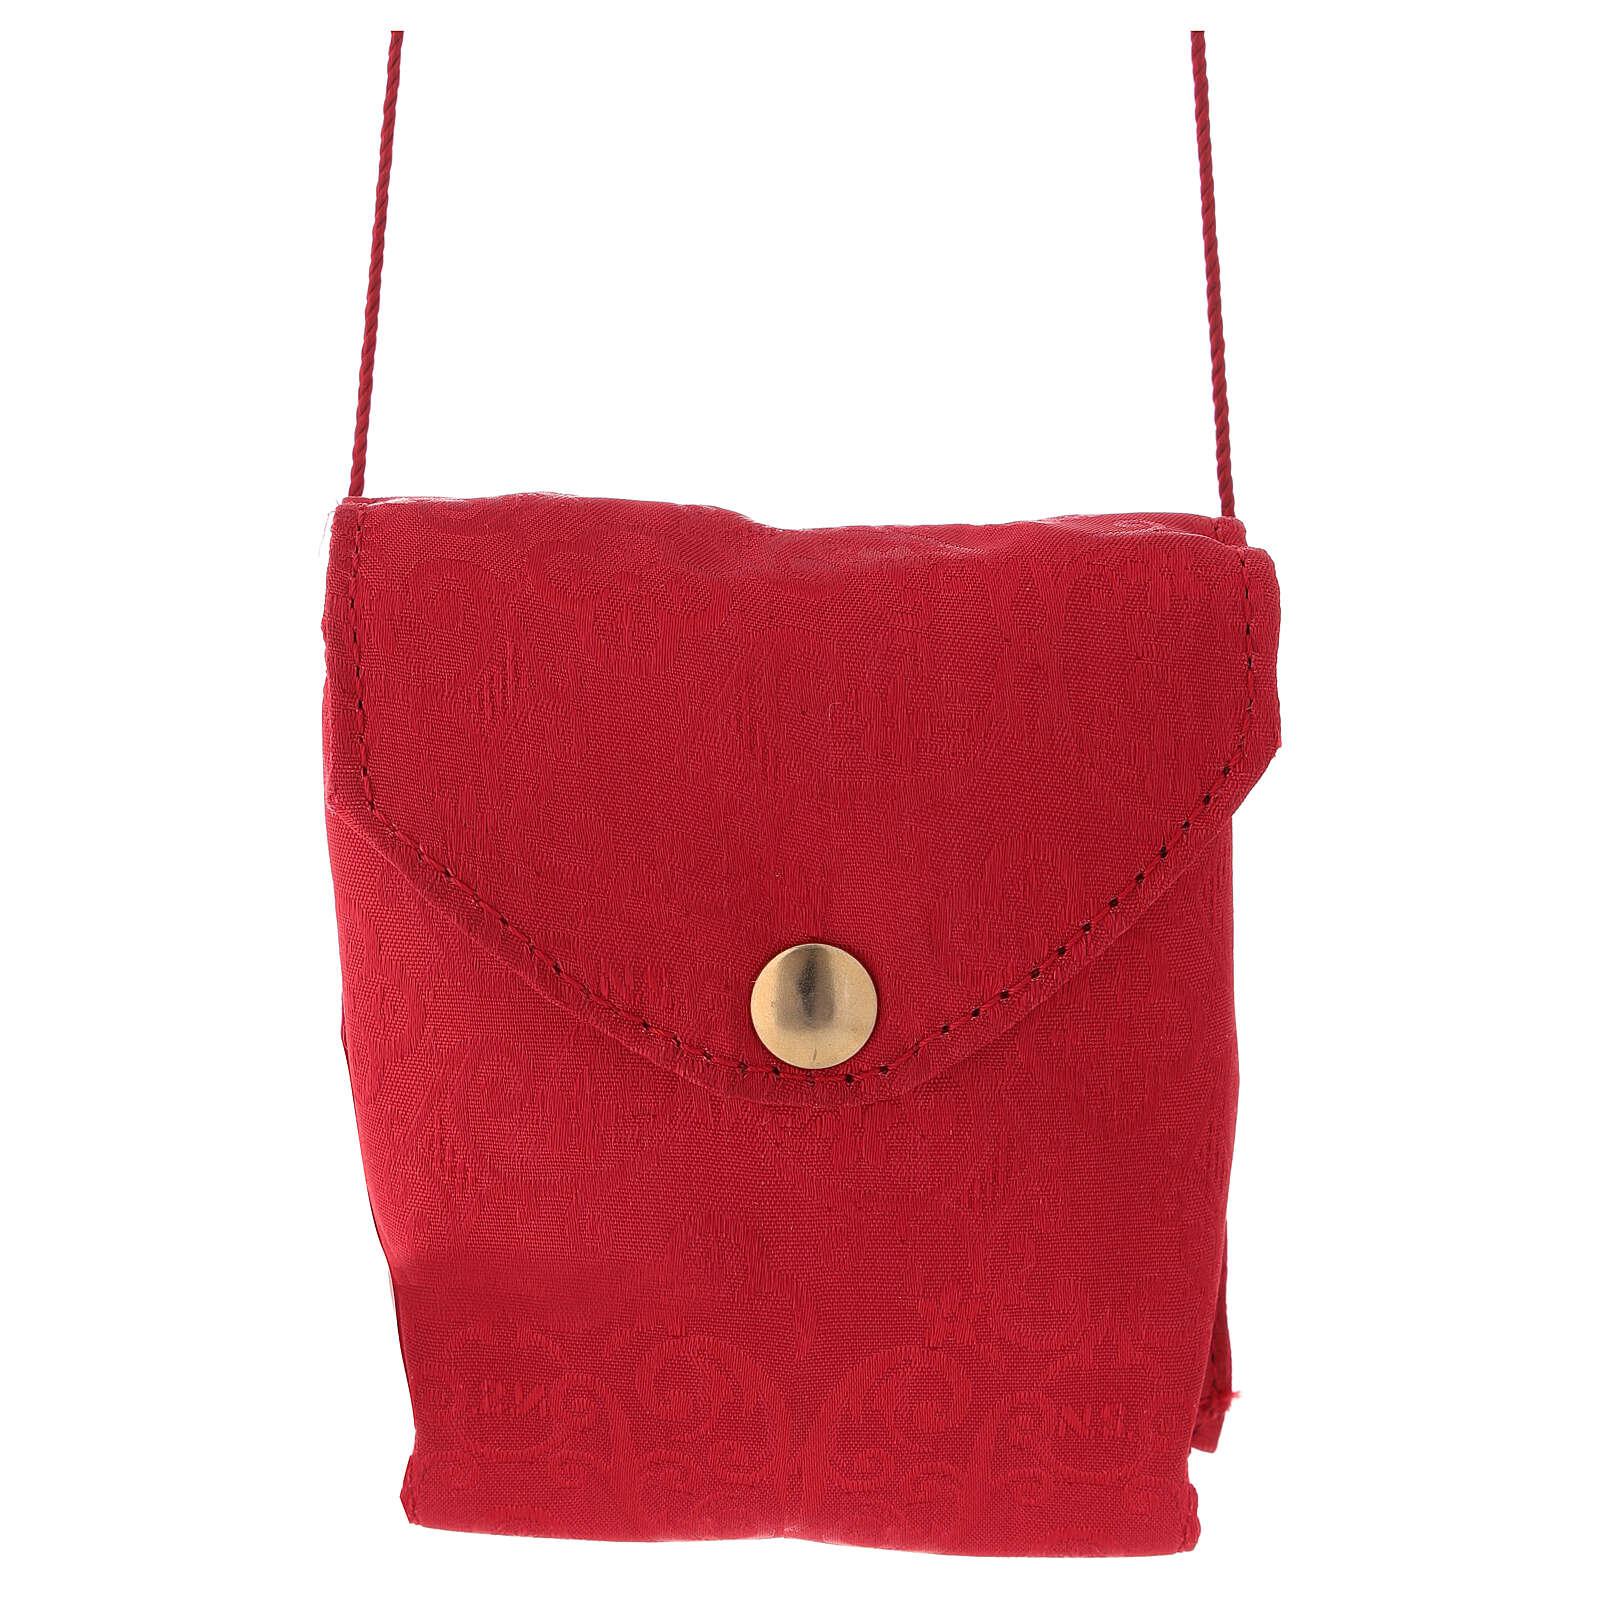 Caja para hostias placa esmalto XP estuche jacquard rojo 3